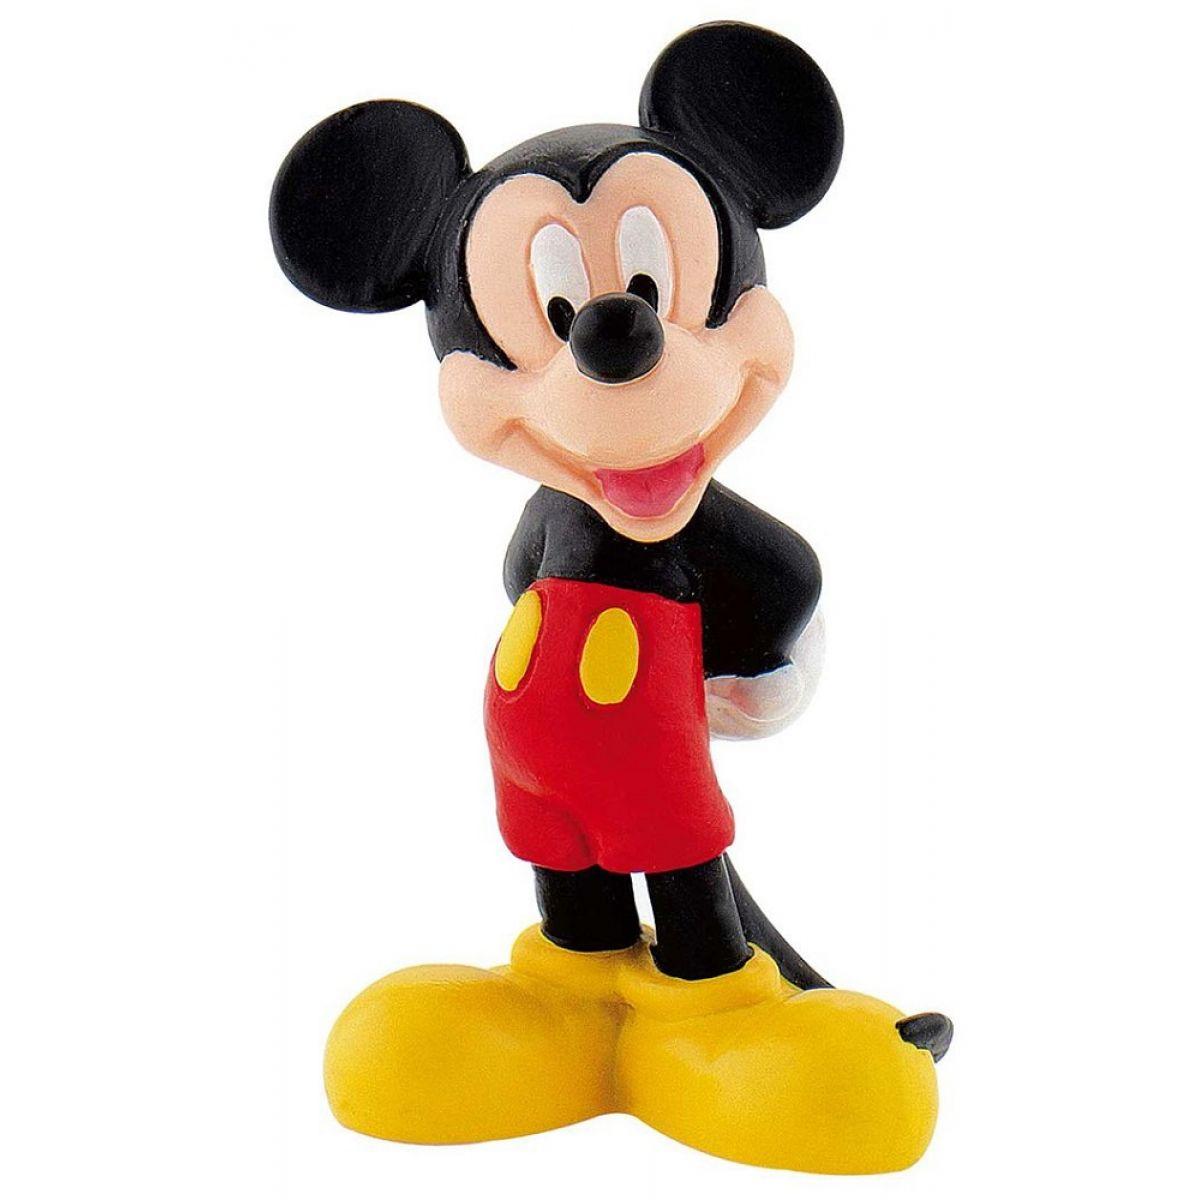 Bullyland 15348 Disney Mickey Mouse